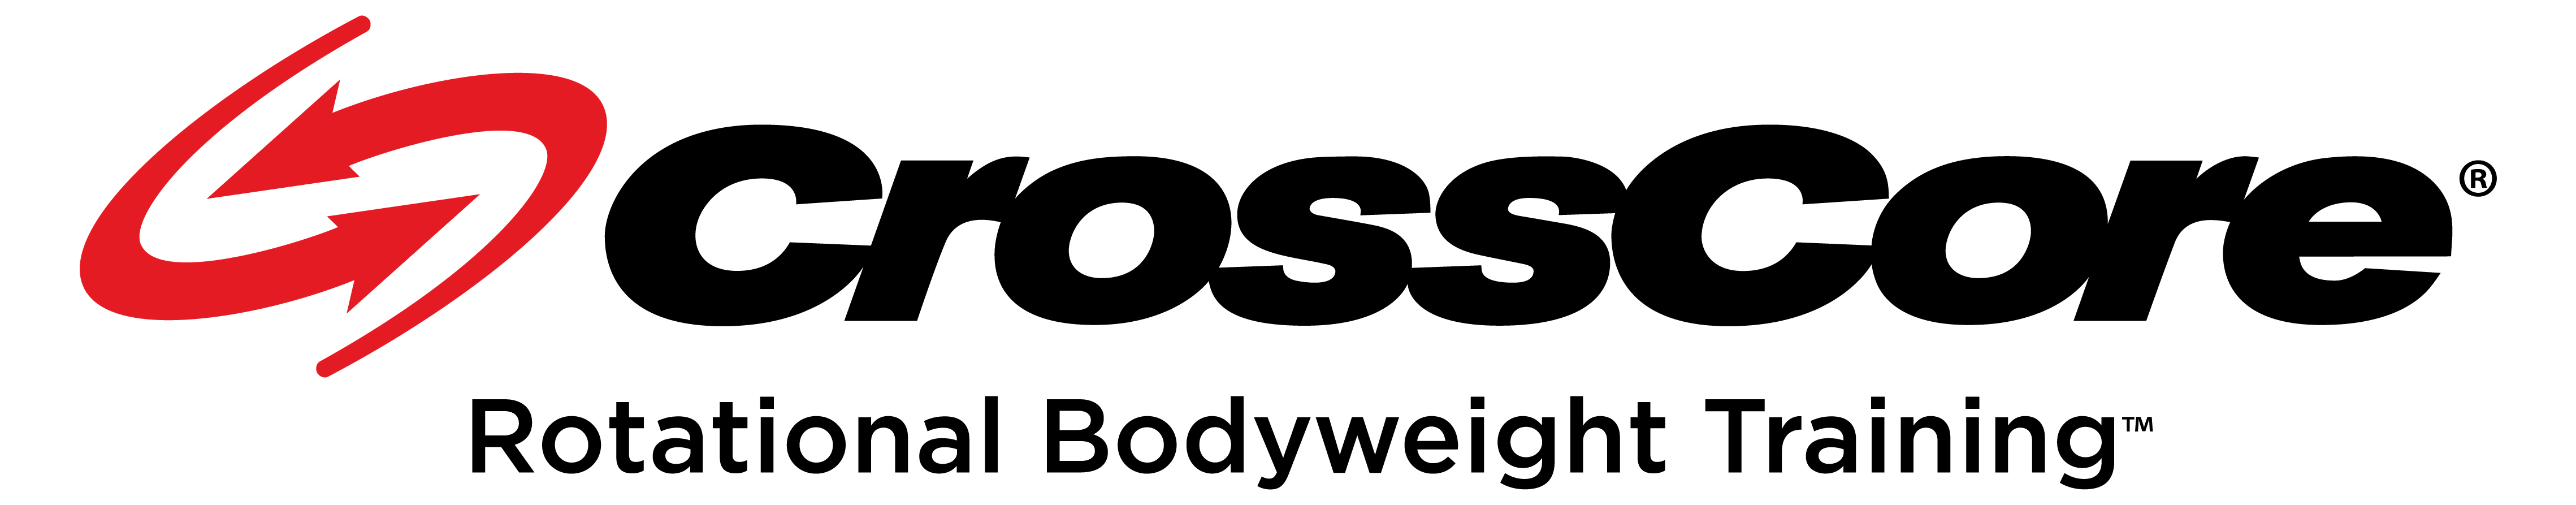 Issa Certified Logos